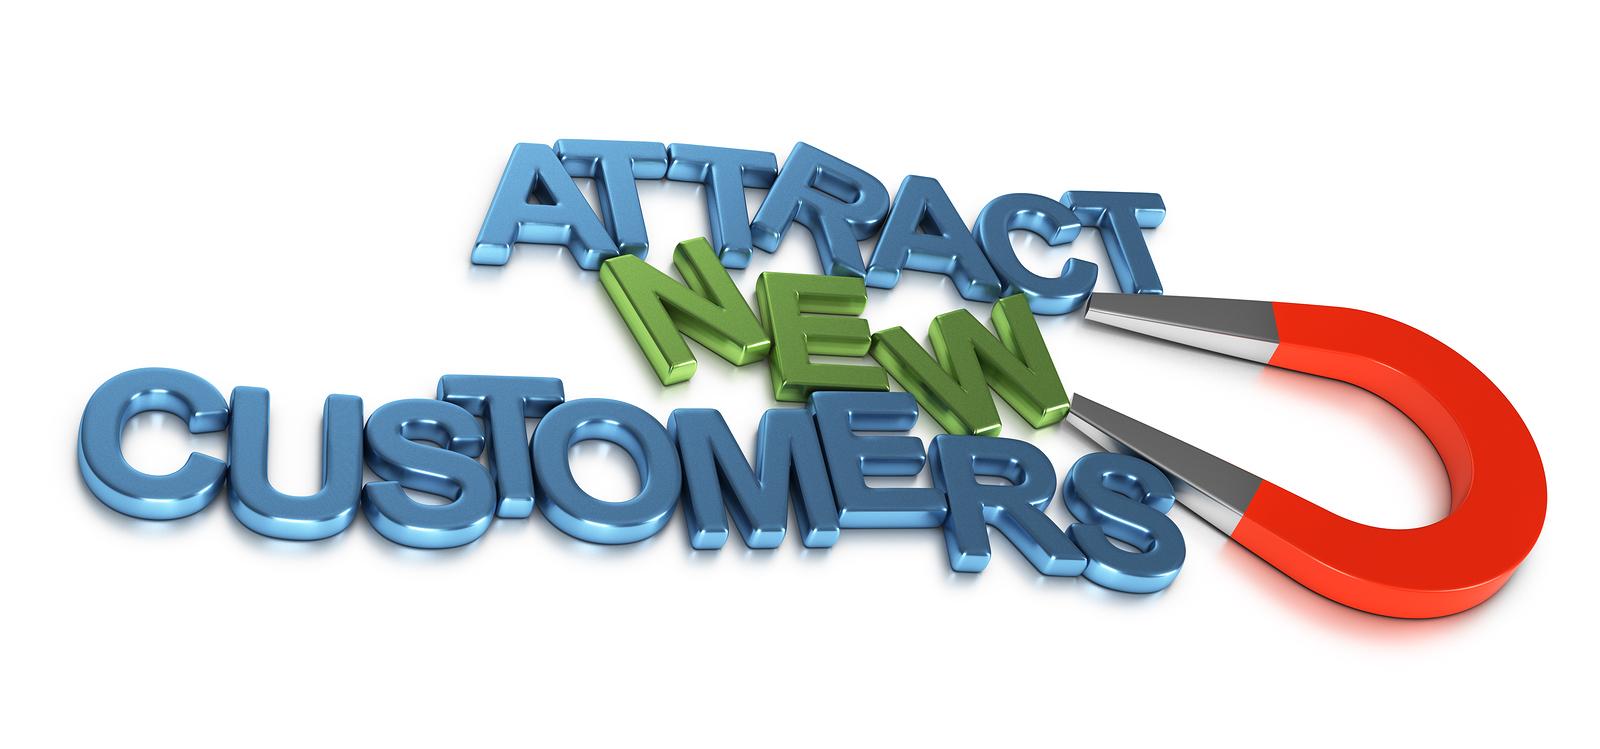 bigstock-Attract-New-Customers-Busines-114949334.jpg